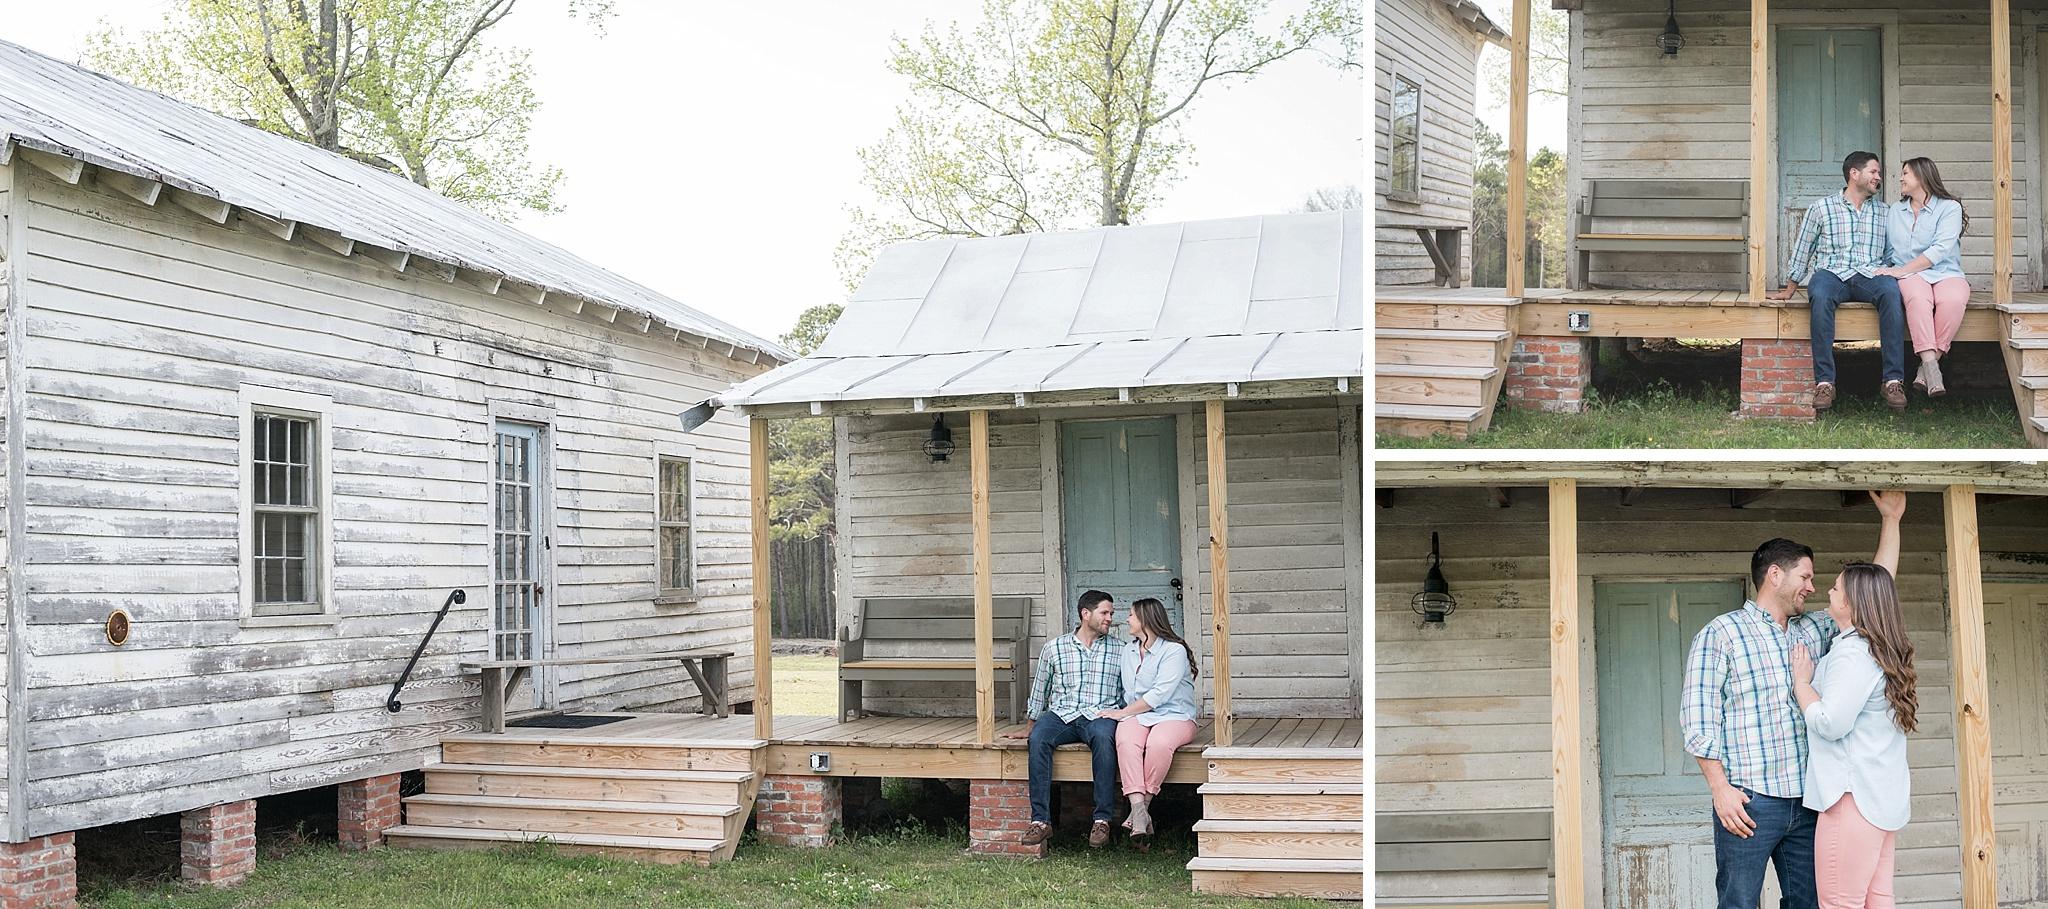 May-Lew-Farm-Farmville-NC-Photographer-057.jpg